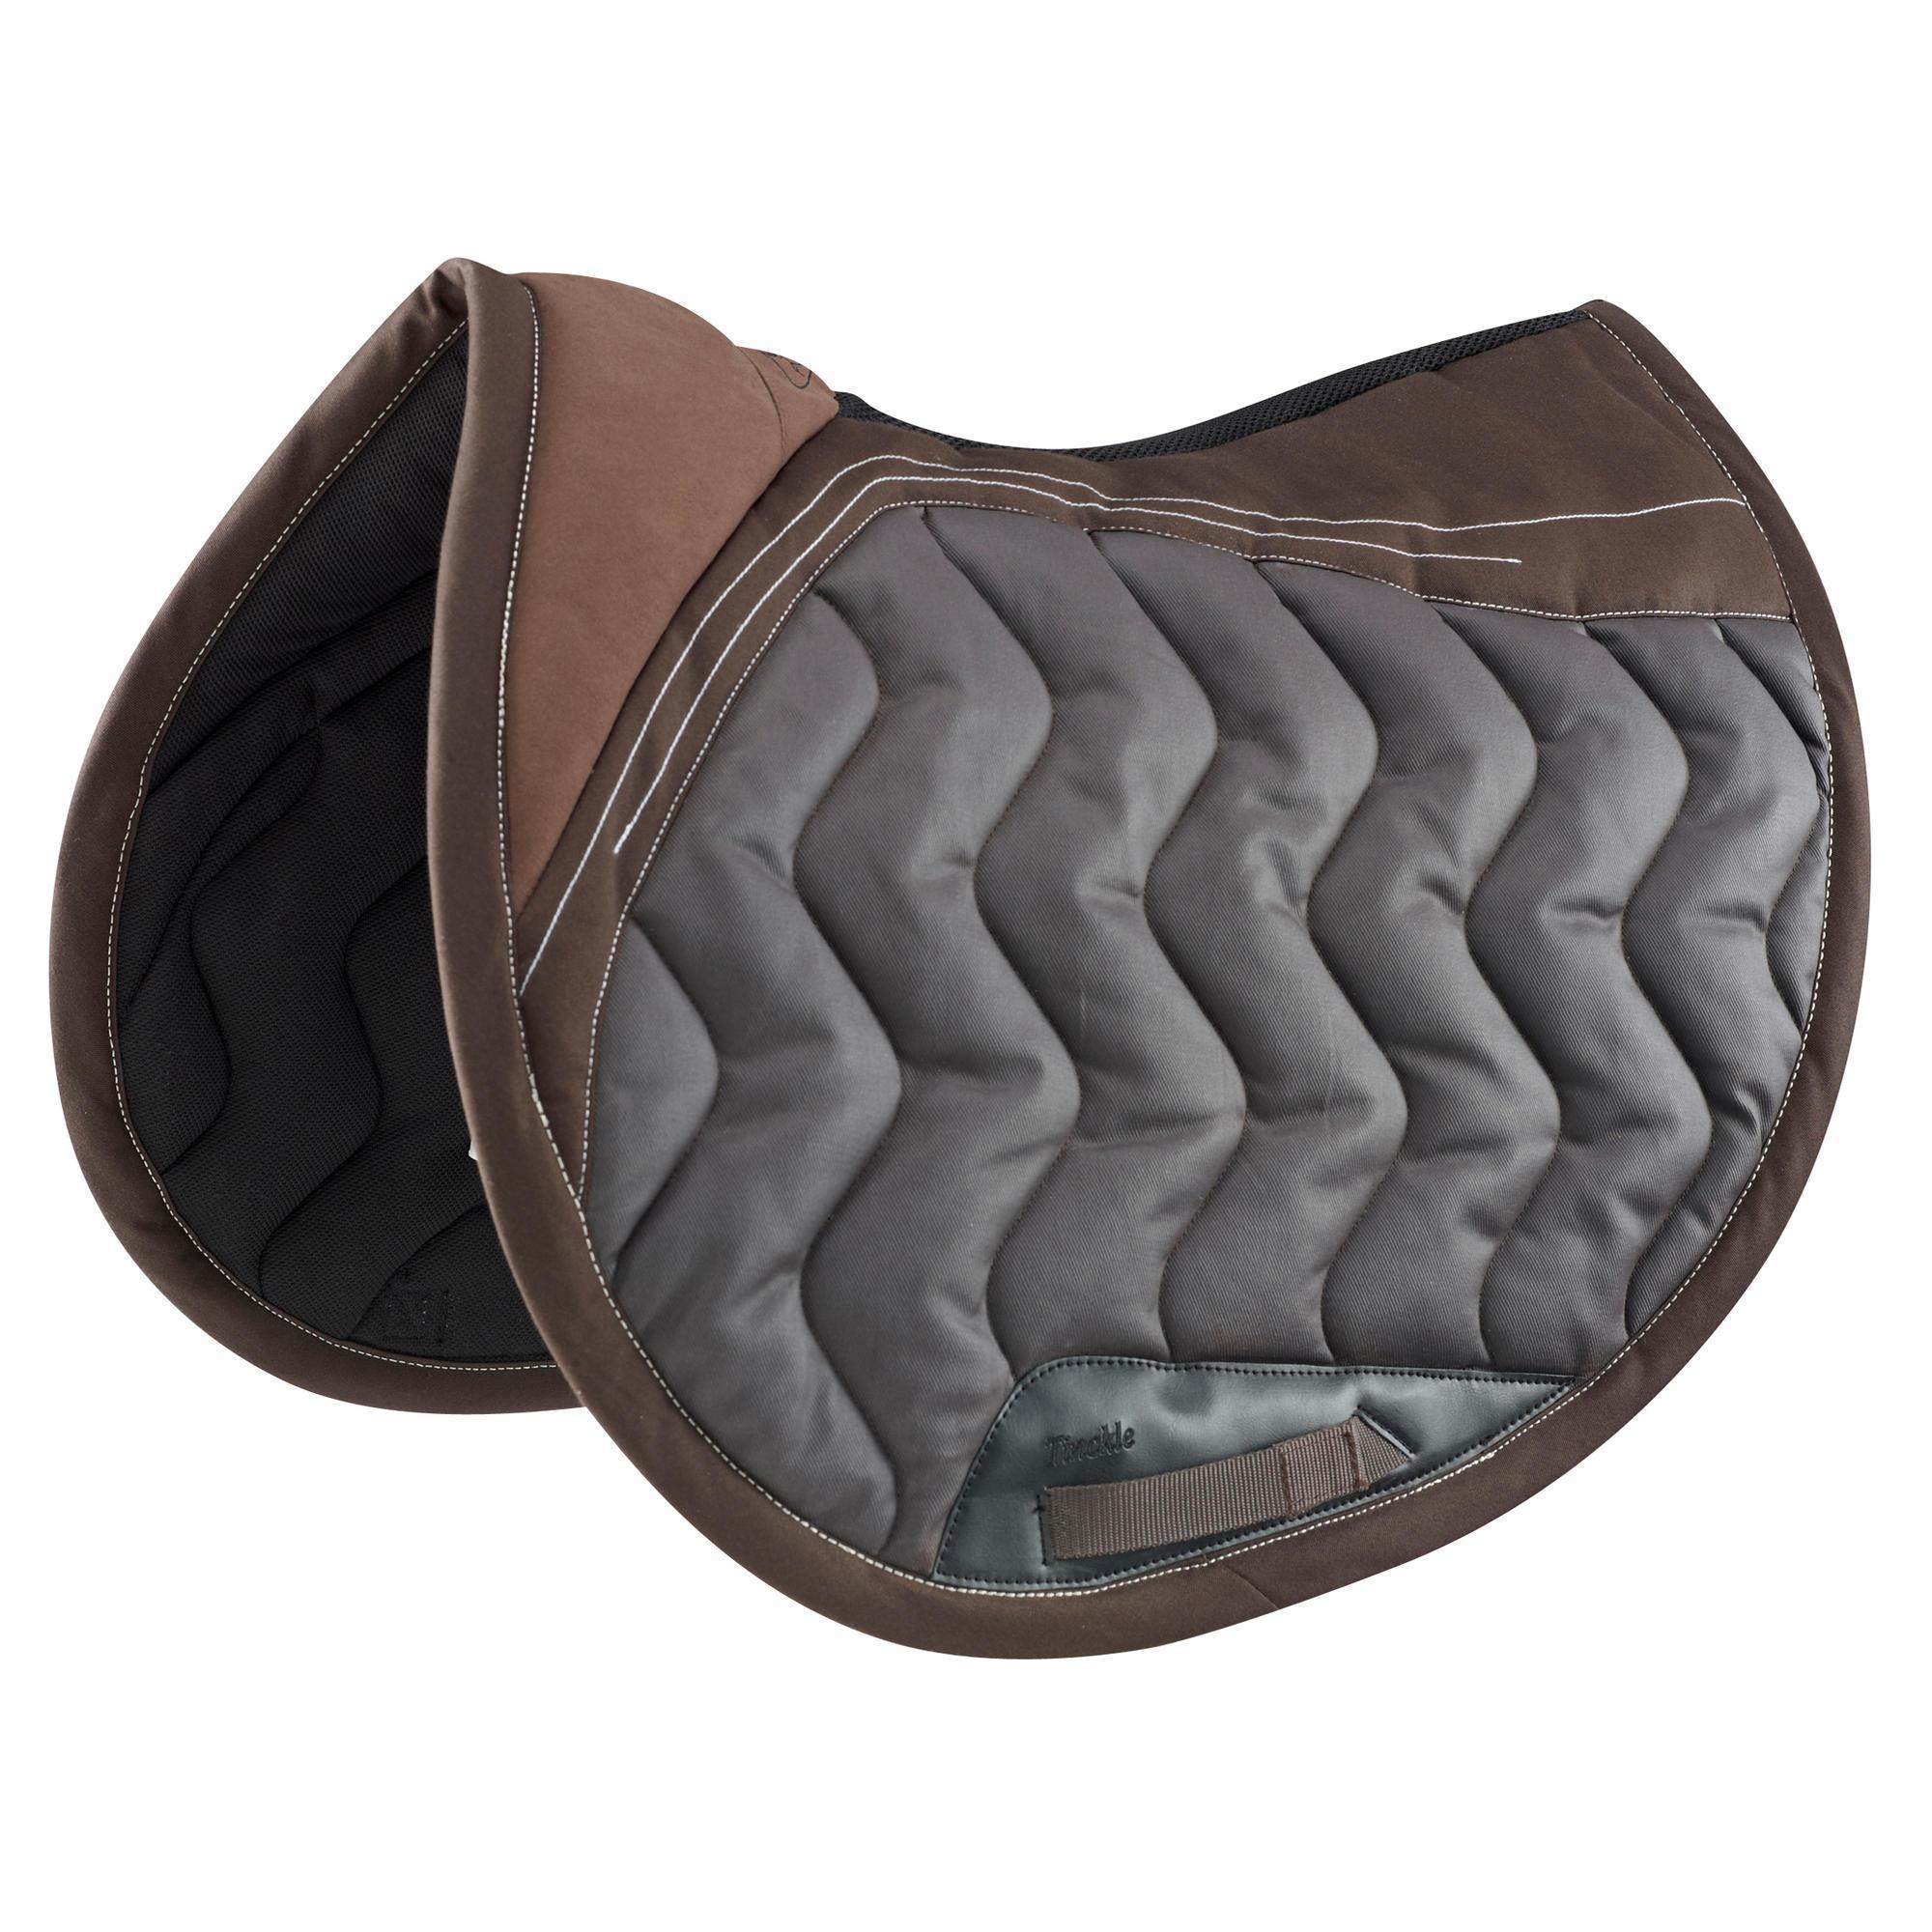 tapis de selle quitation cheval tinckle marron fouganza. Black Bedroom Furniture Sets. Home Design Ideas